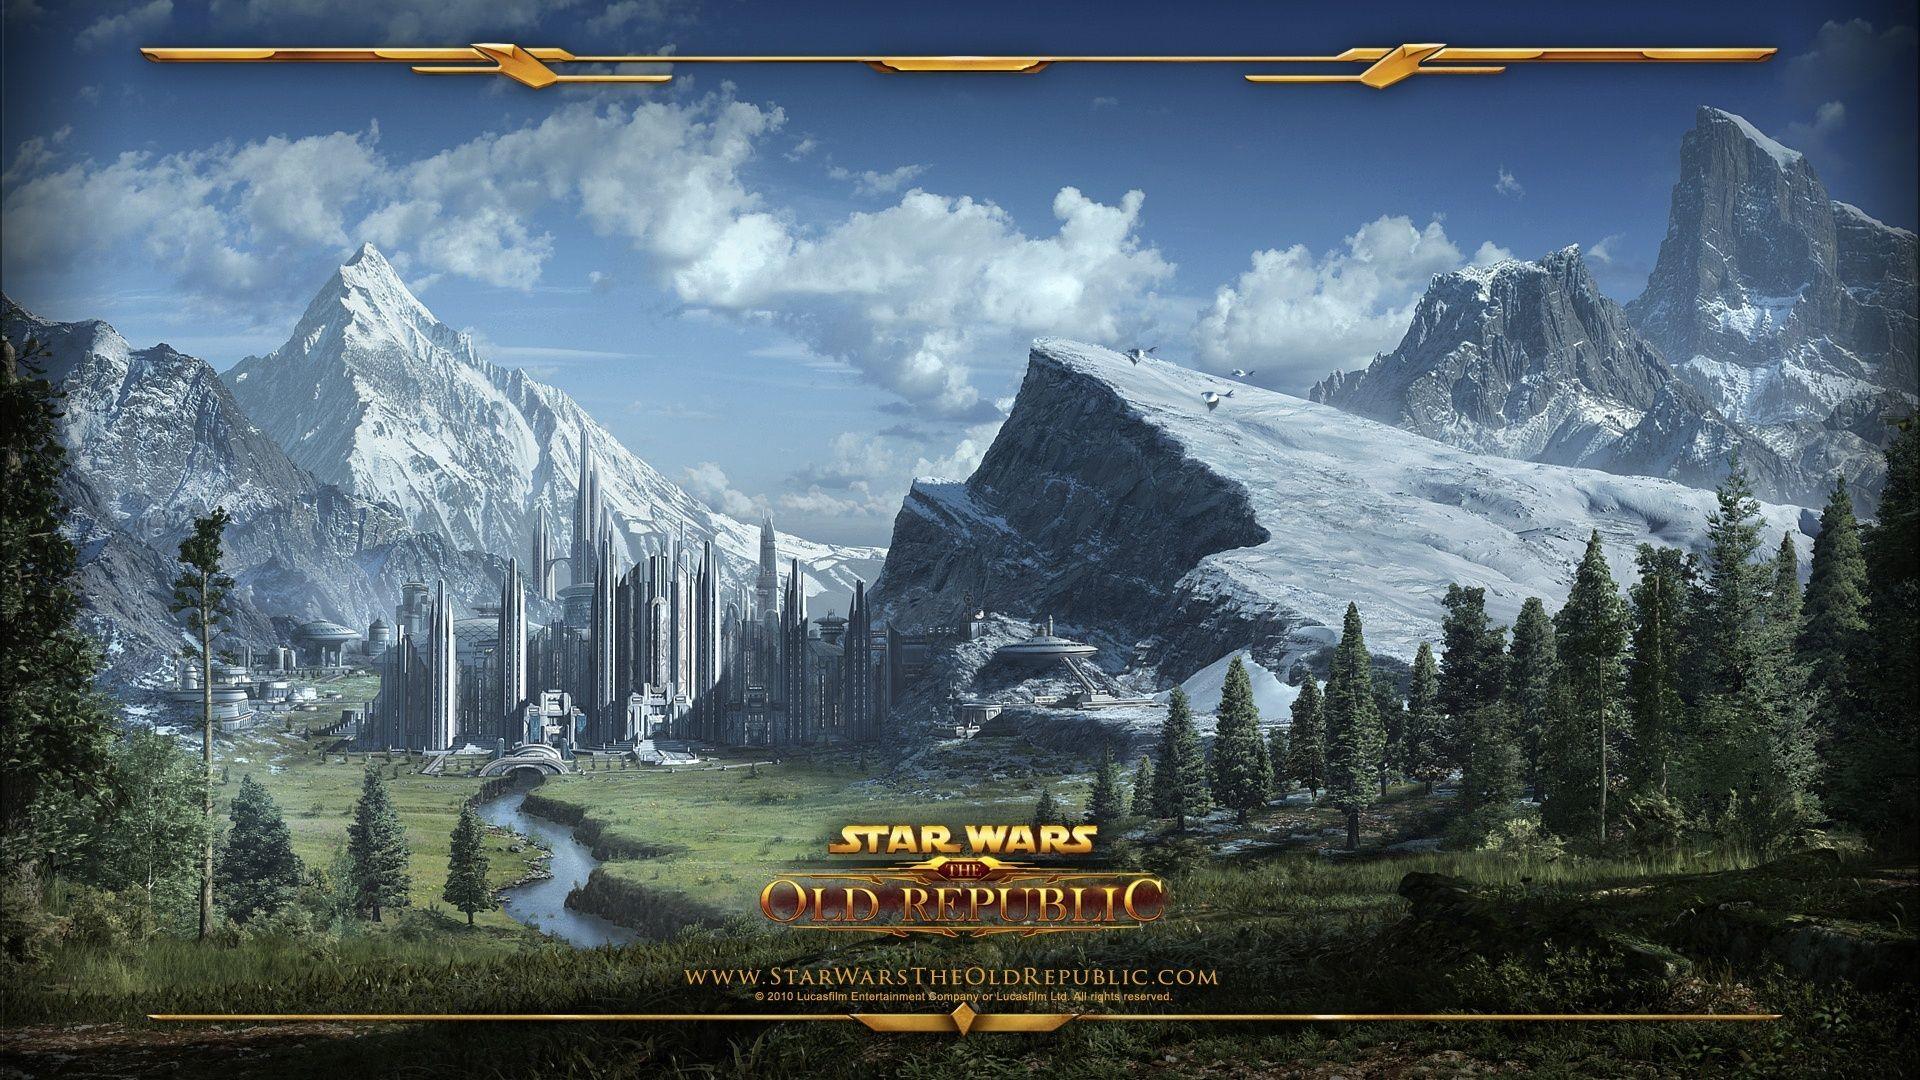 Star Wars- The Old Republic HD Wallpaper